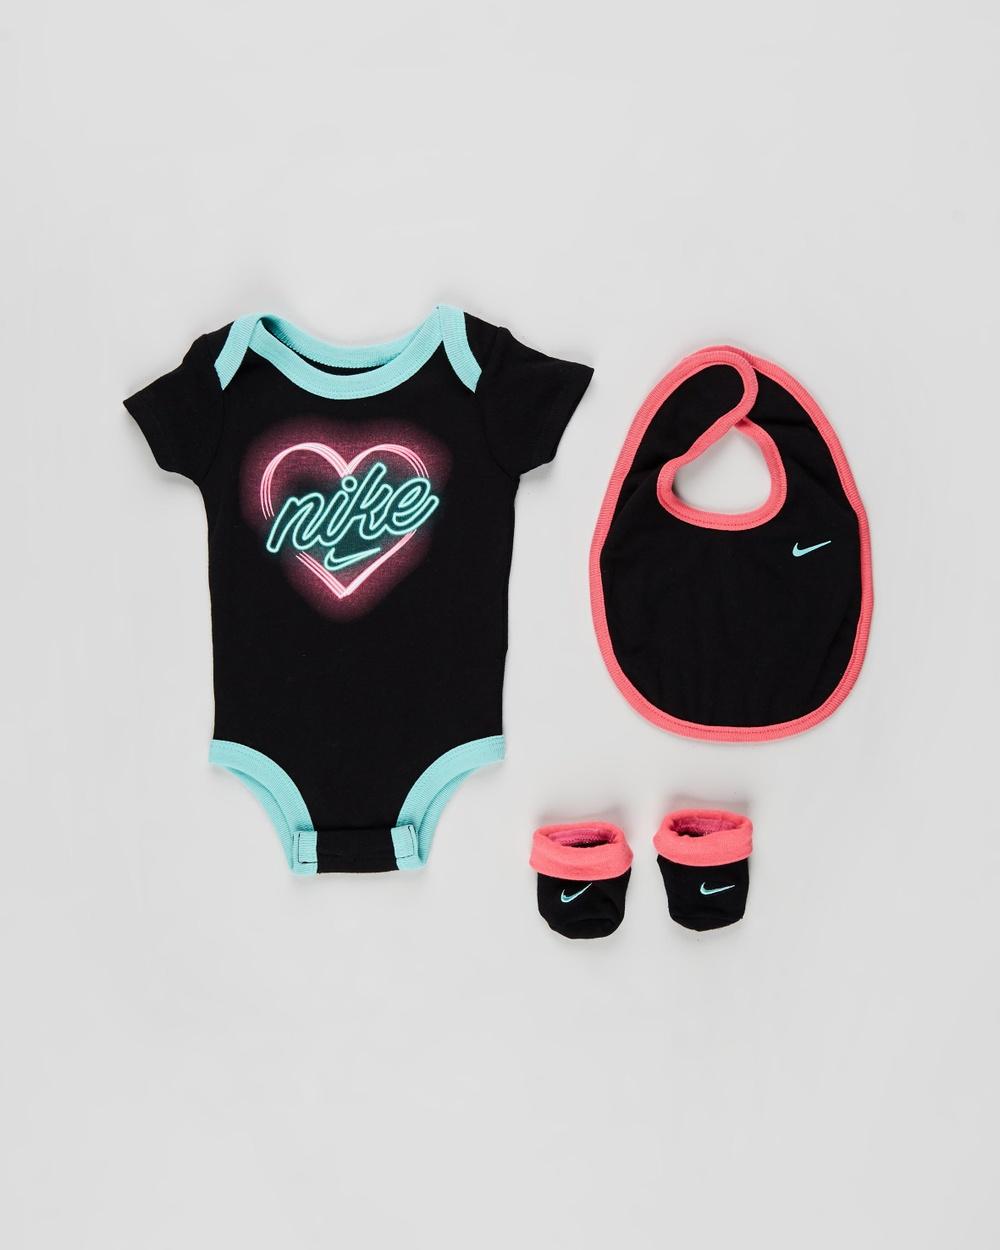 Nike Bodysuit, Bib and Booties Set Babies Bibs Black